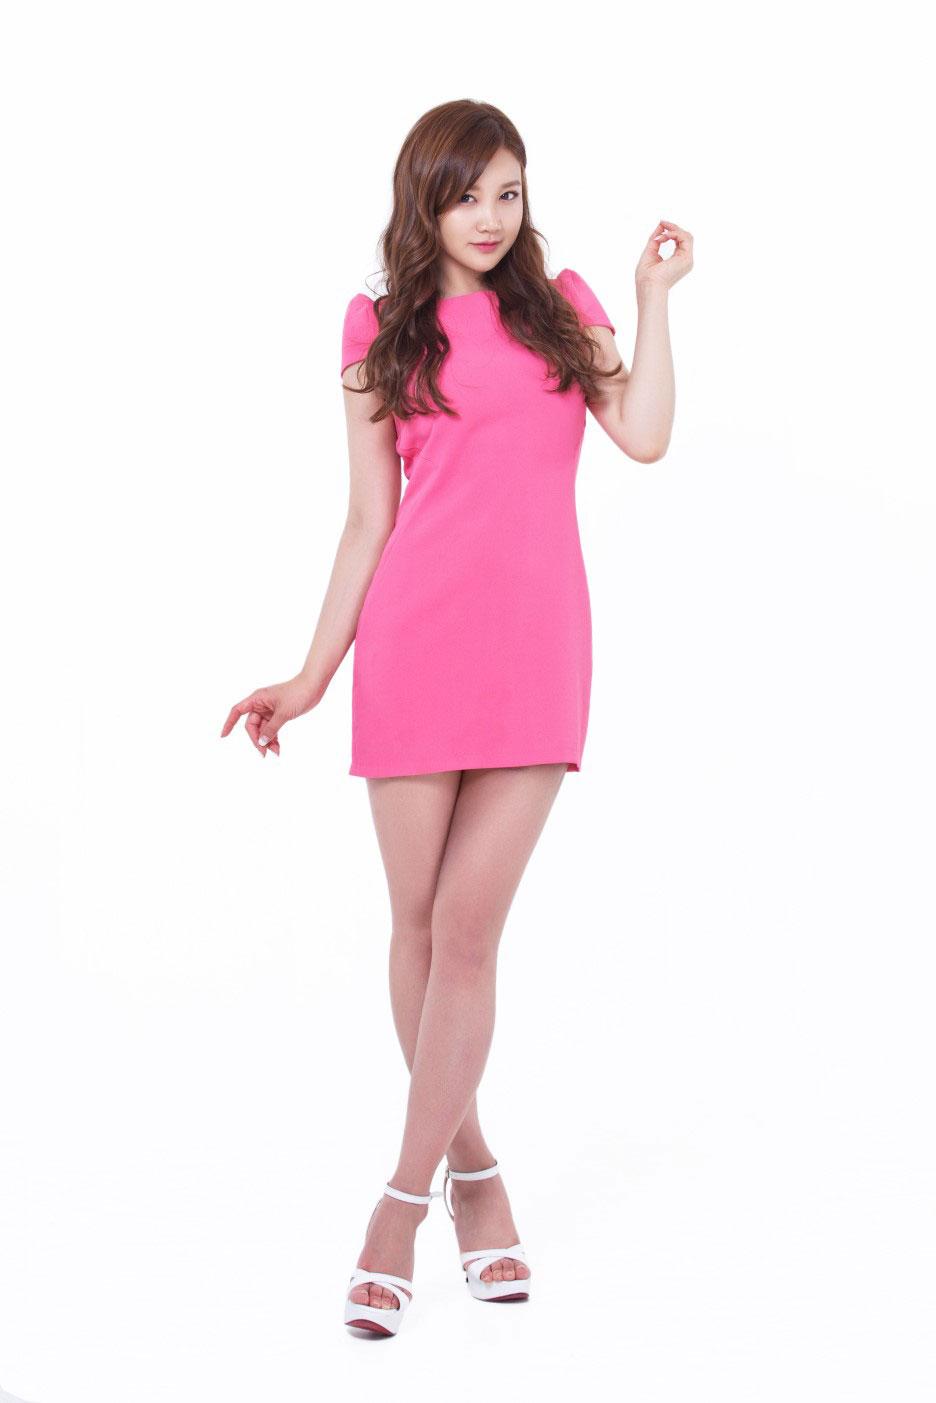 Bae Hyeji OMG Rainbow broadcast show